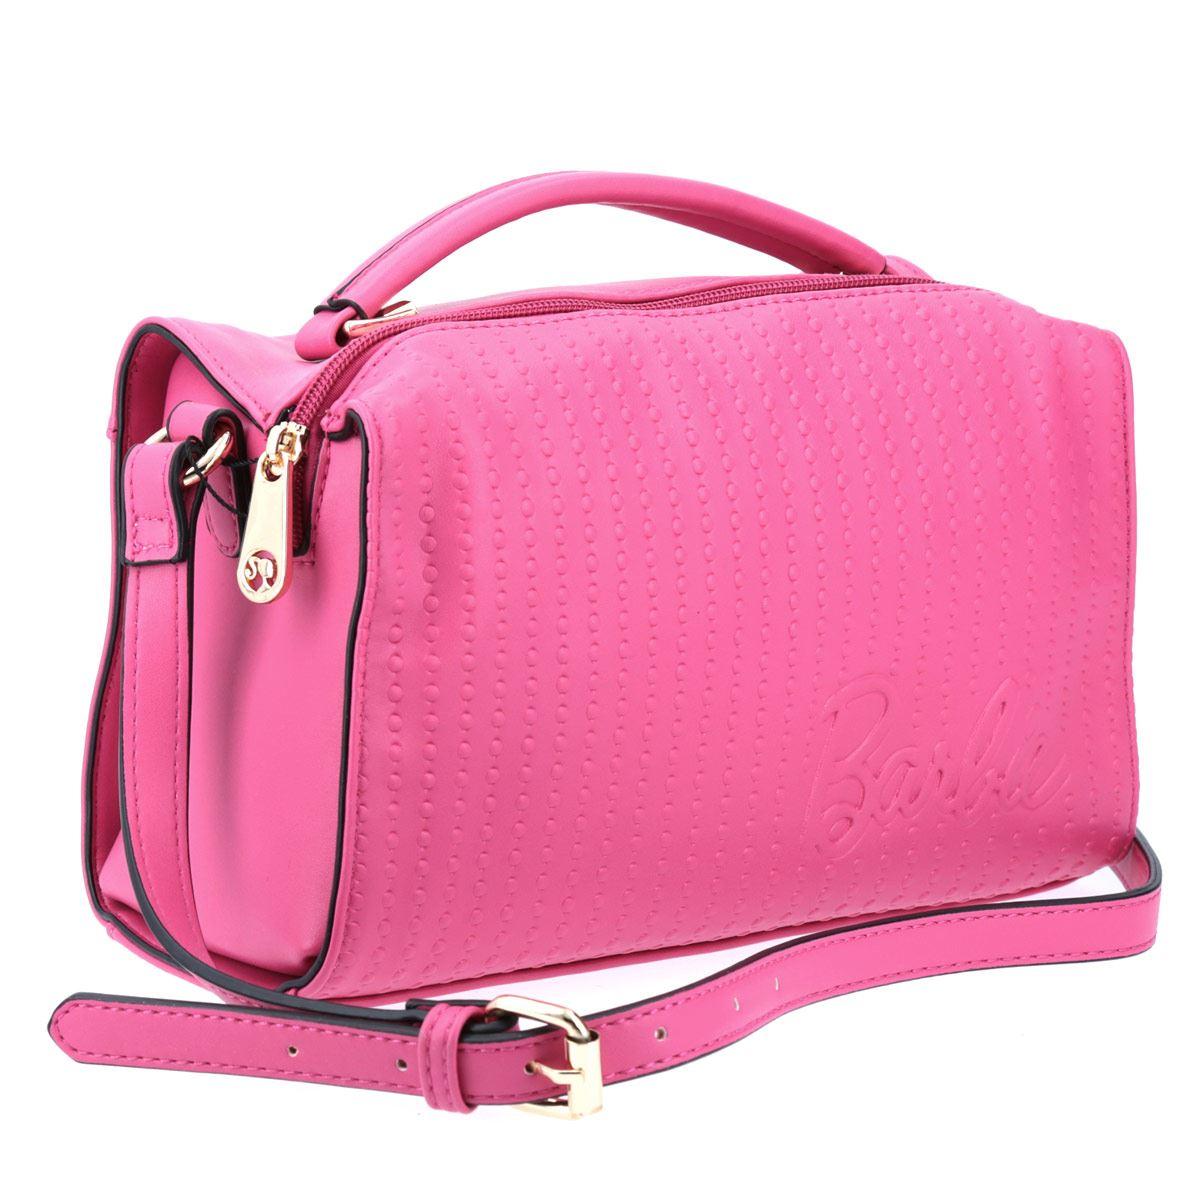 Bolso Barbie crossbody rosa